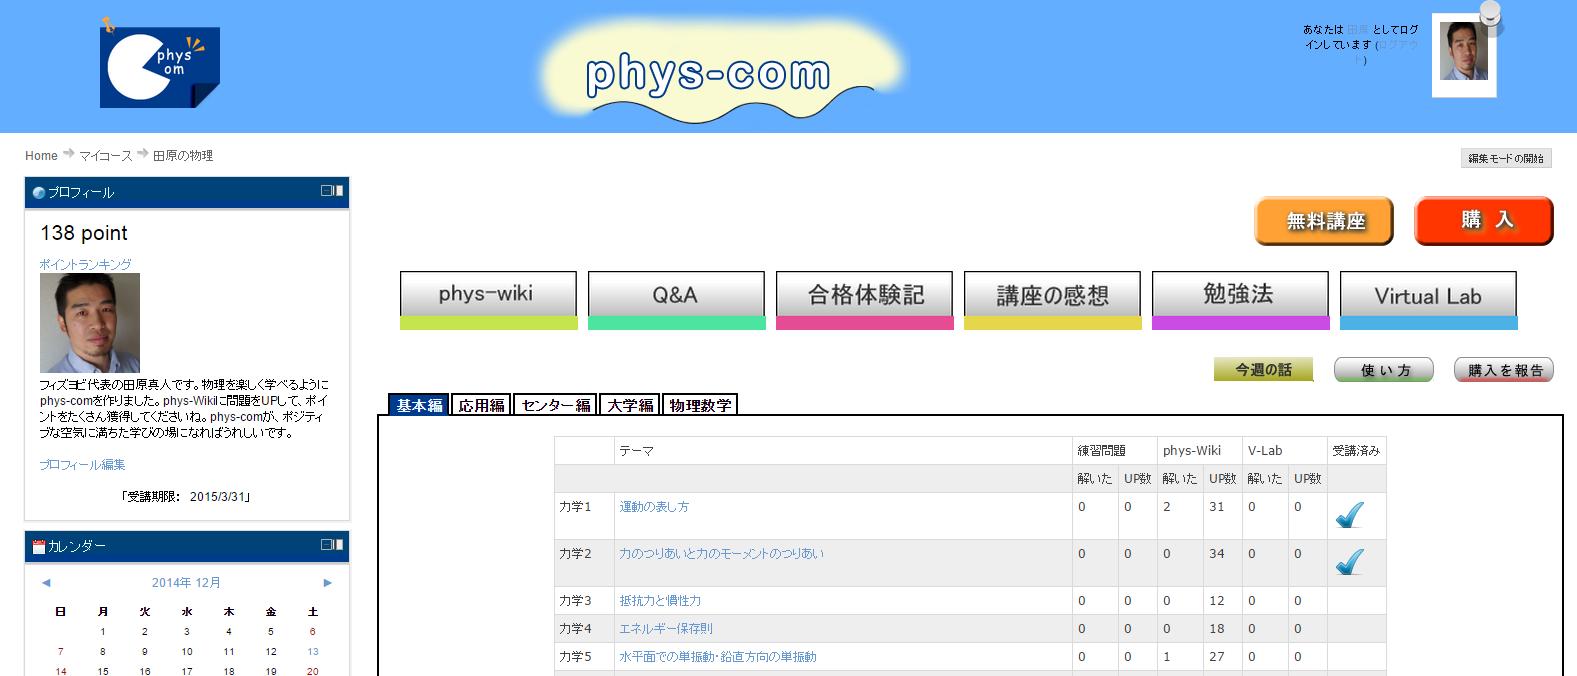 physcom2